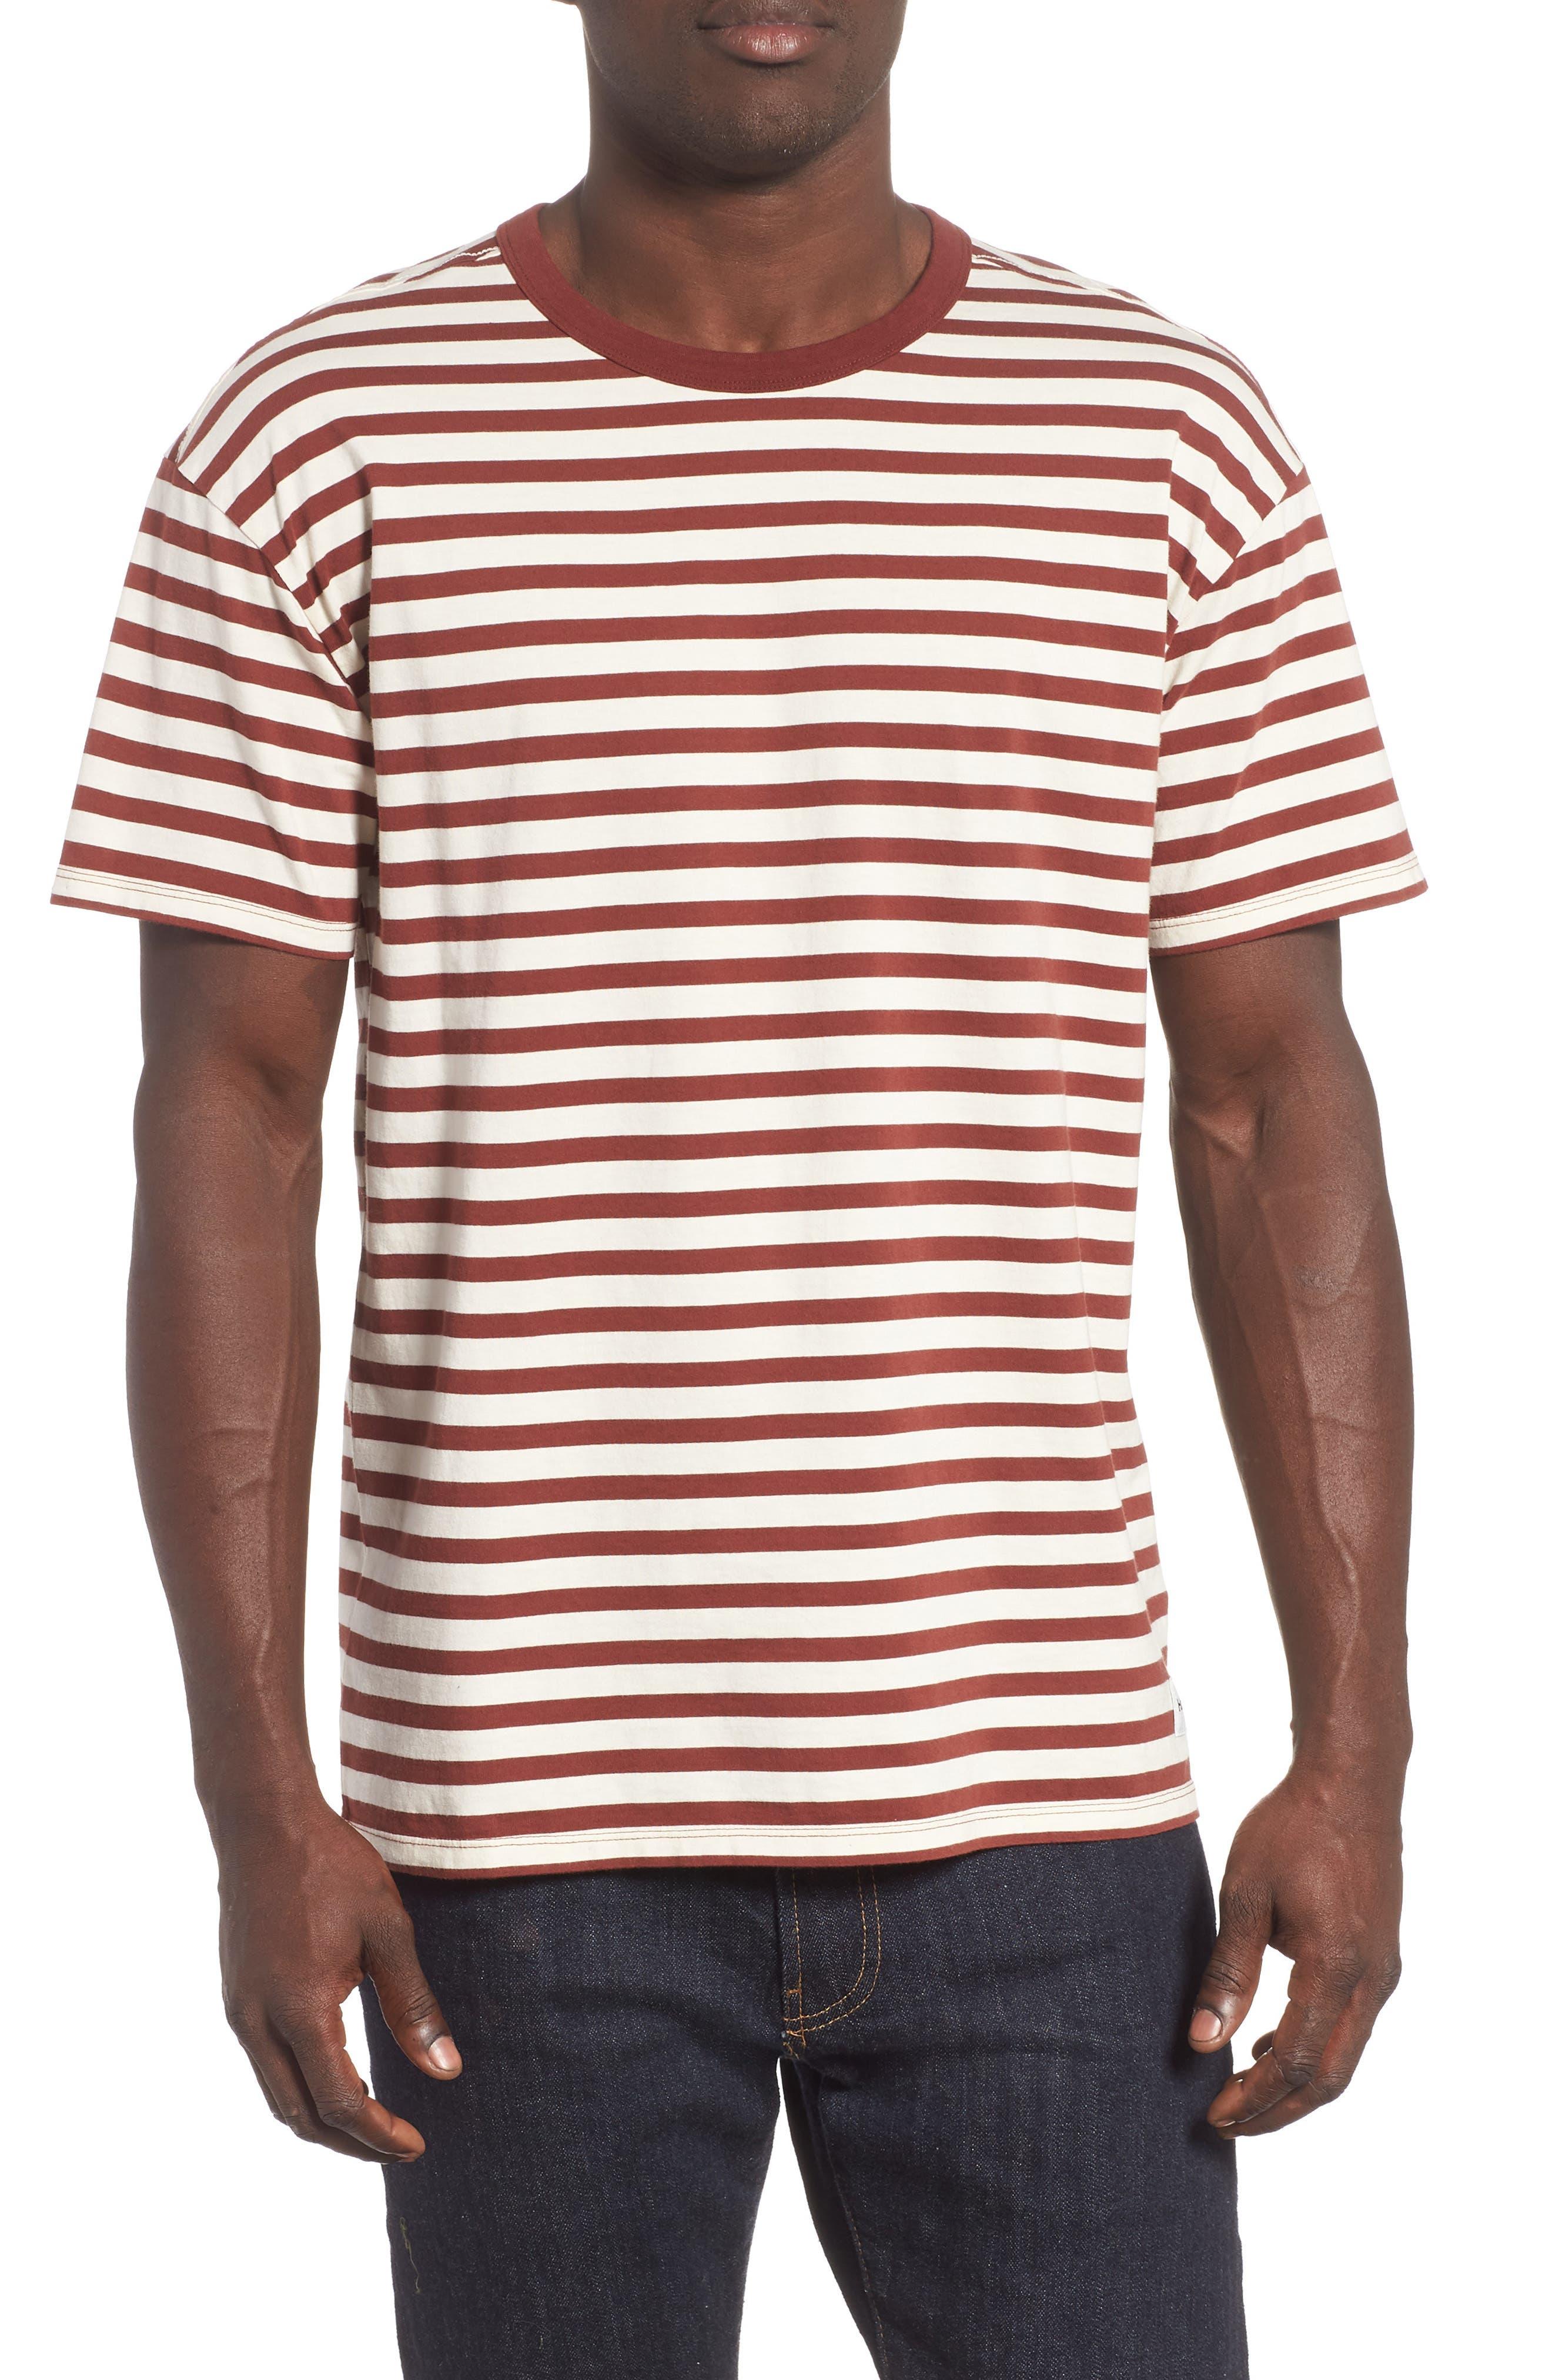 Hurley Salton Stripe T-Shirt, Brown